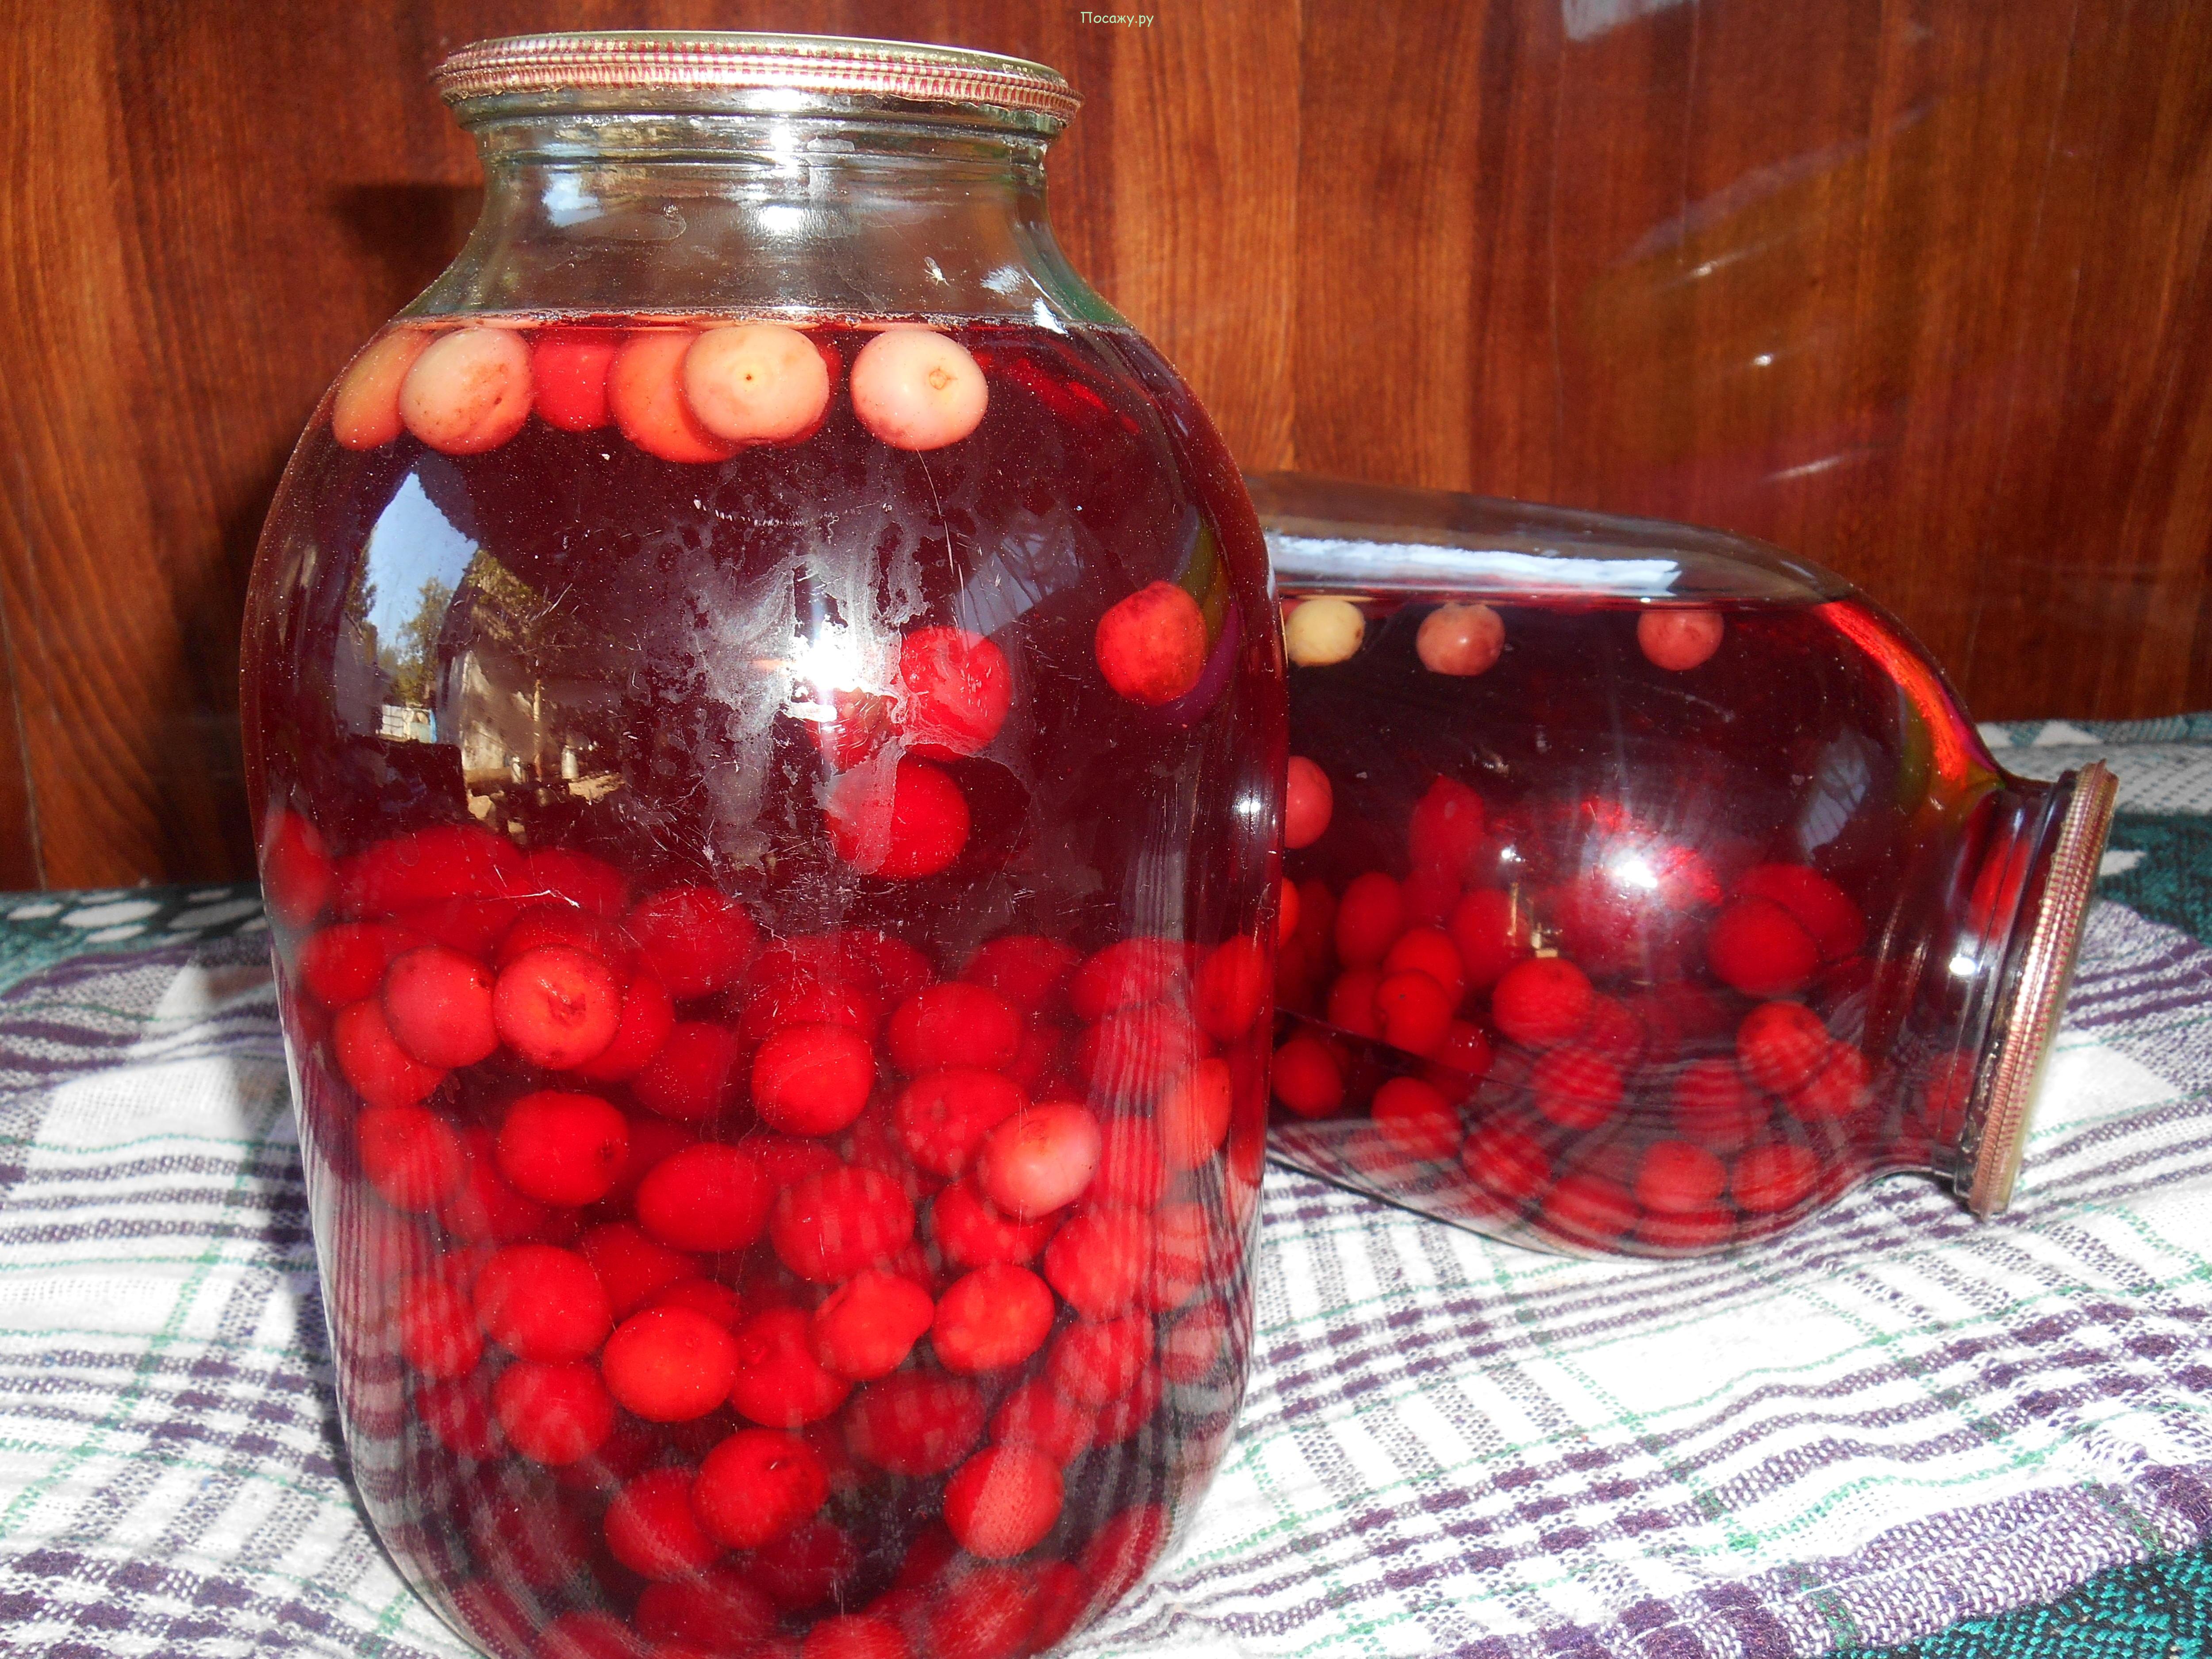 компот из вишни на зиму на 3 литровую банку